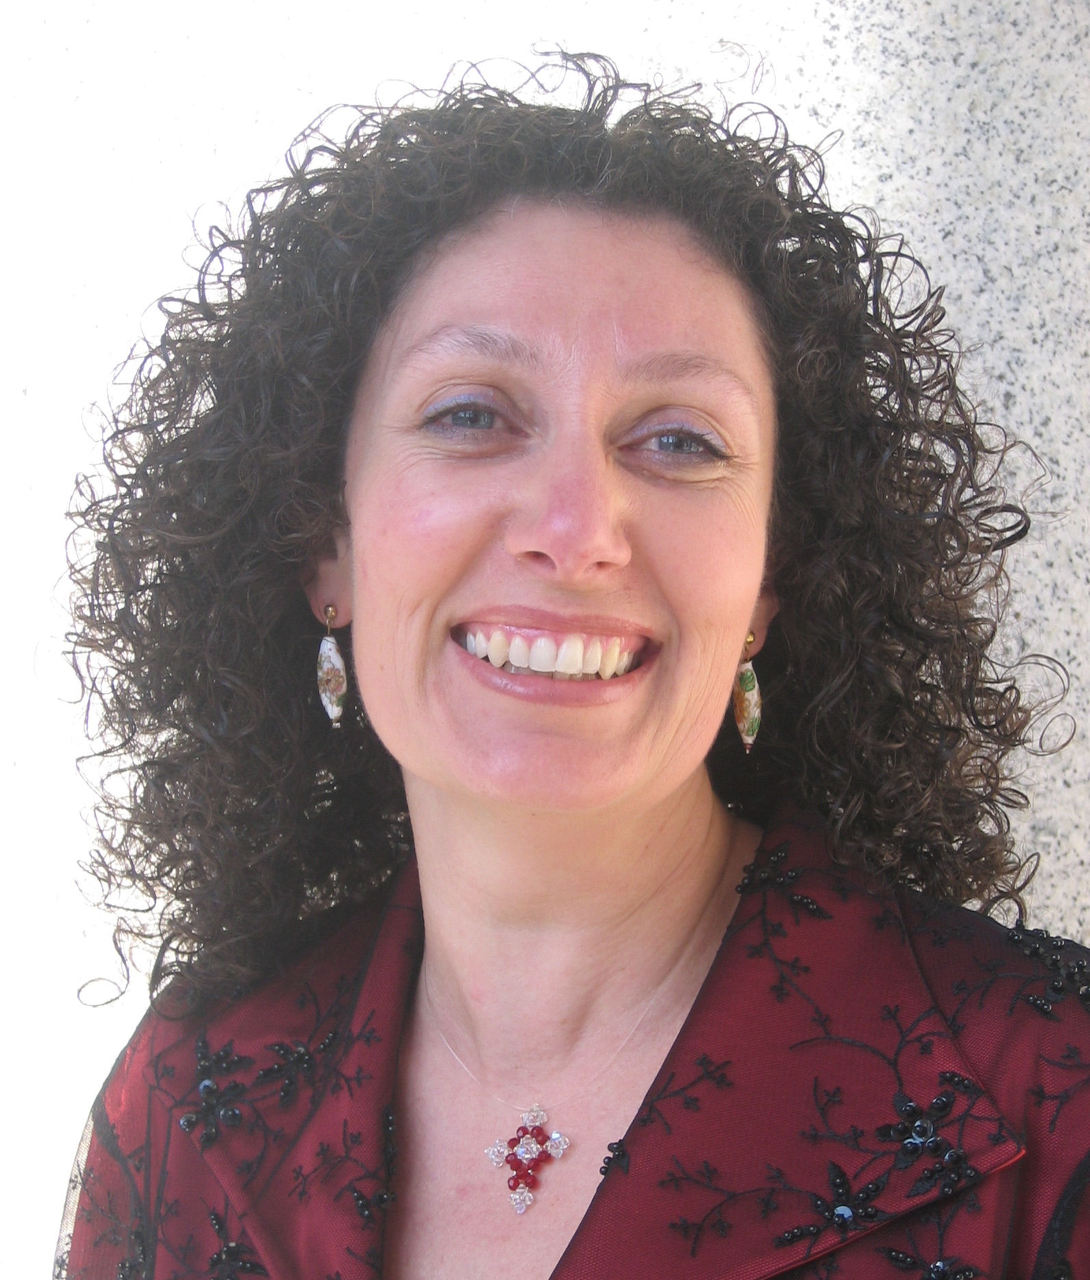 Elisabetta Toscano